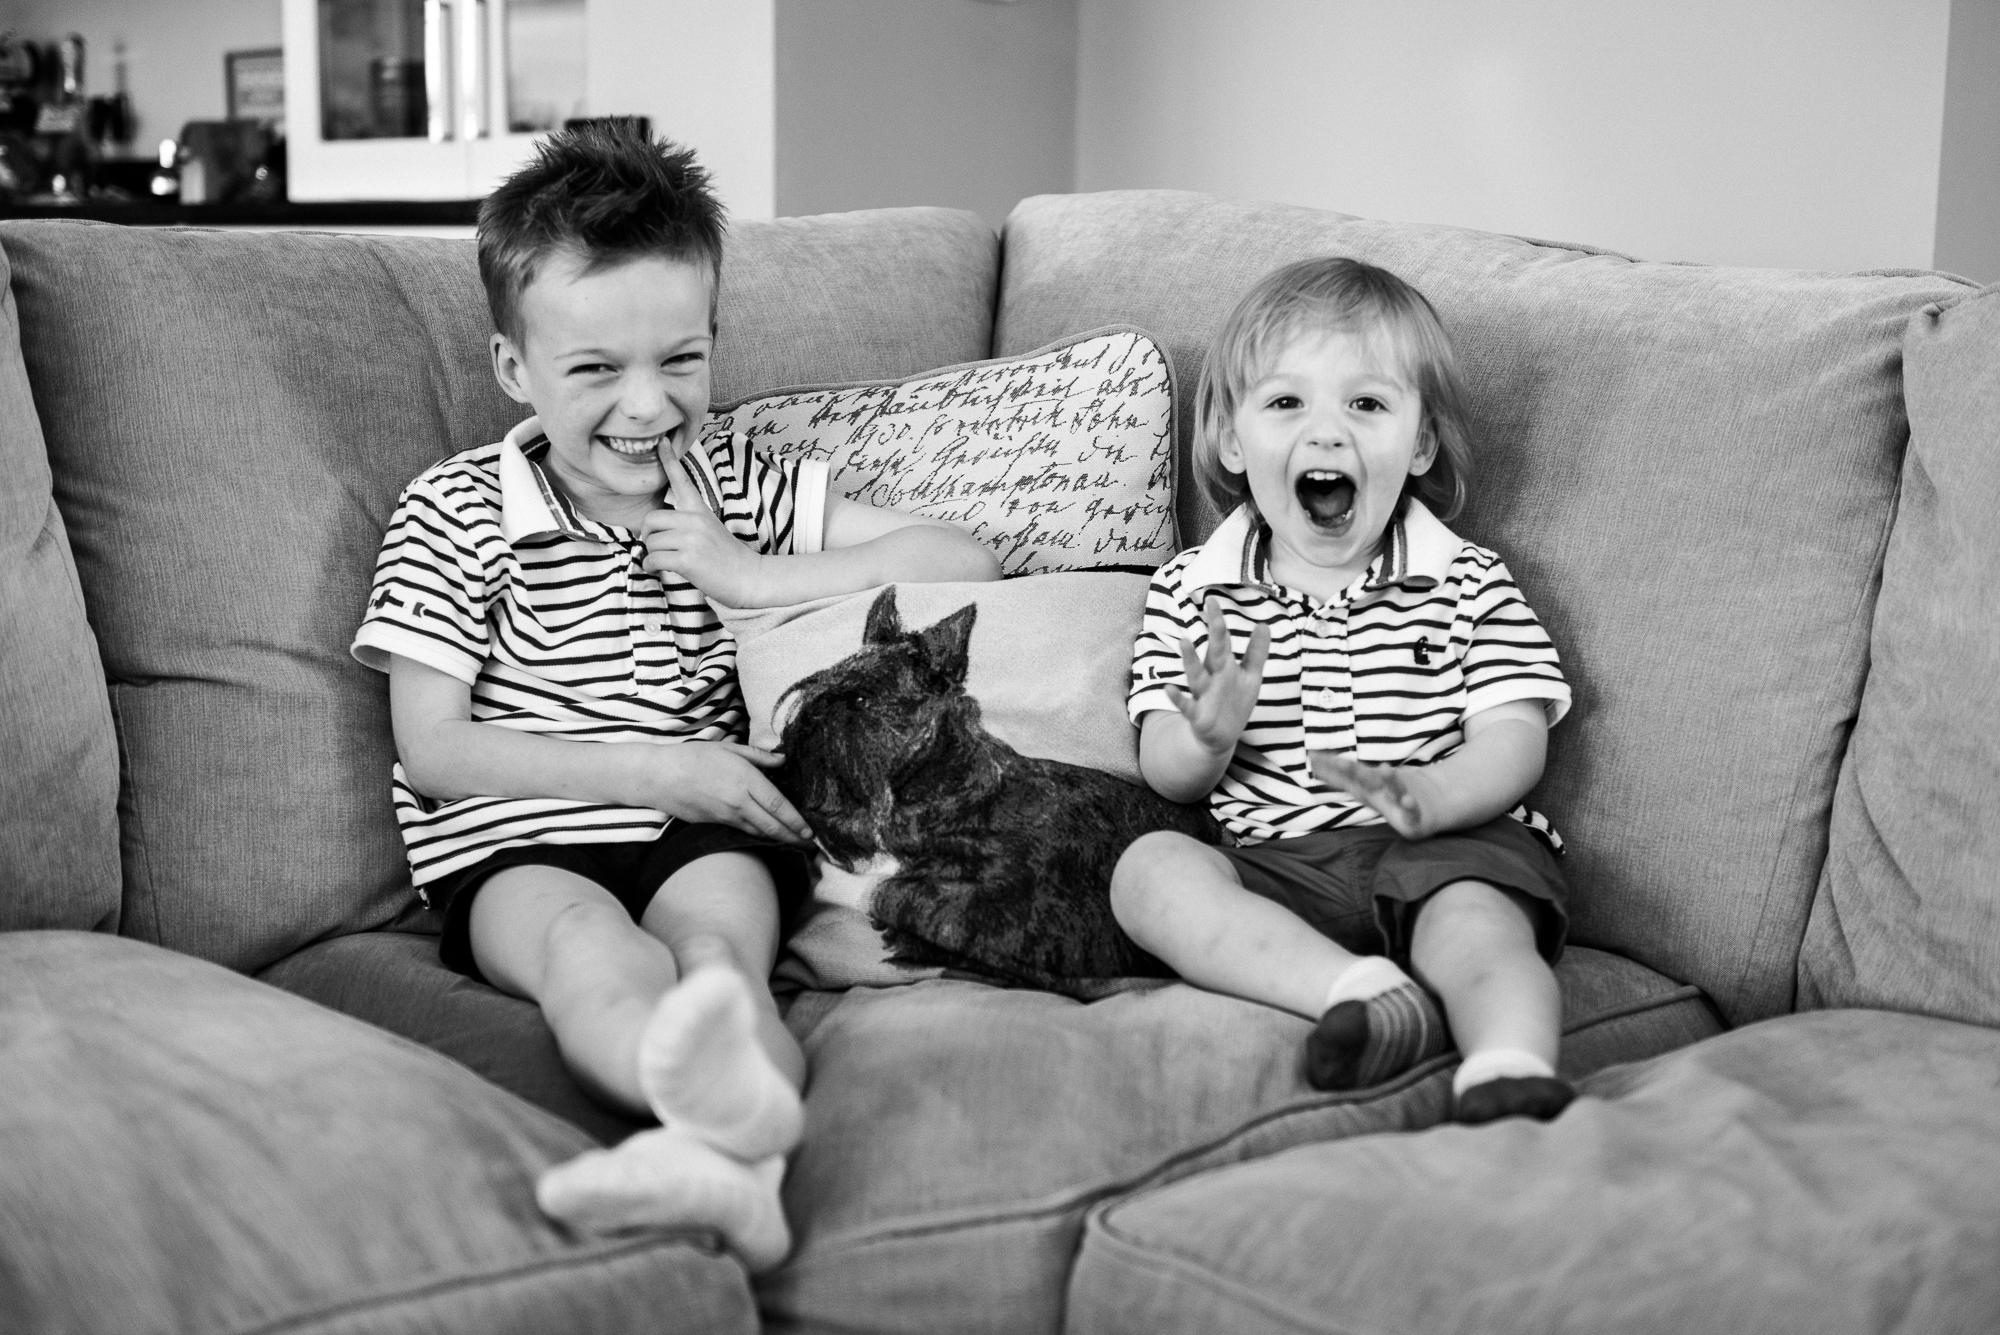 Family Lifestyle Documentary Photography Newborn Photos Candid Family Photographer - Jenny Harper Photography-3.jpg